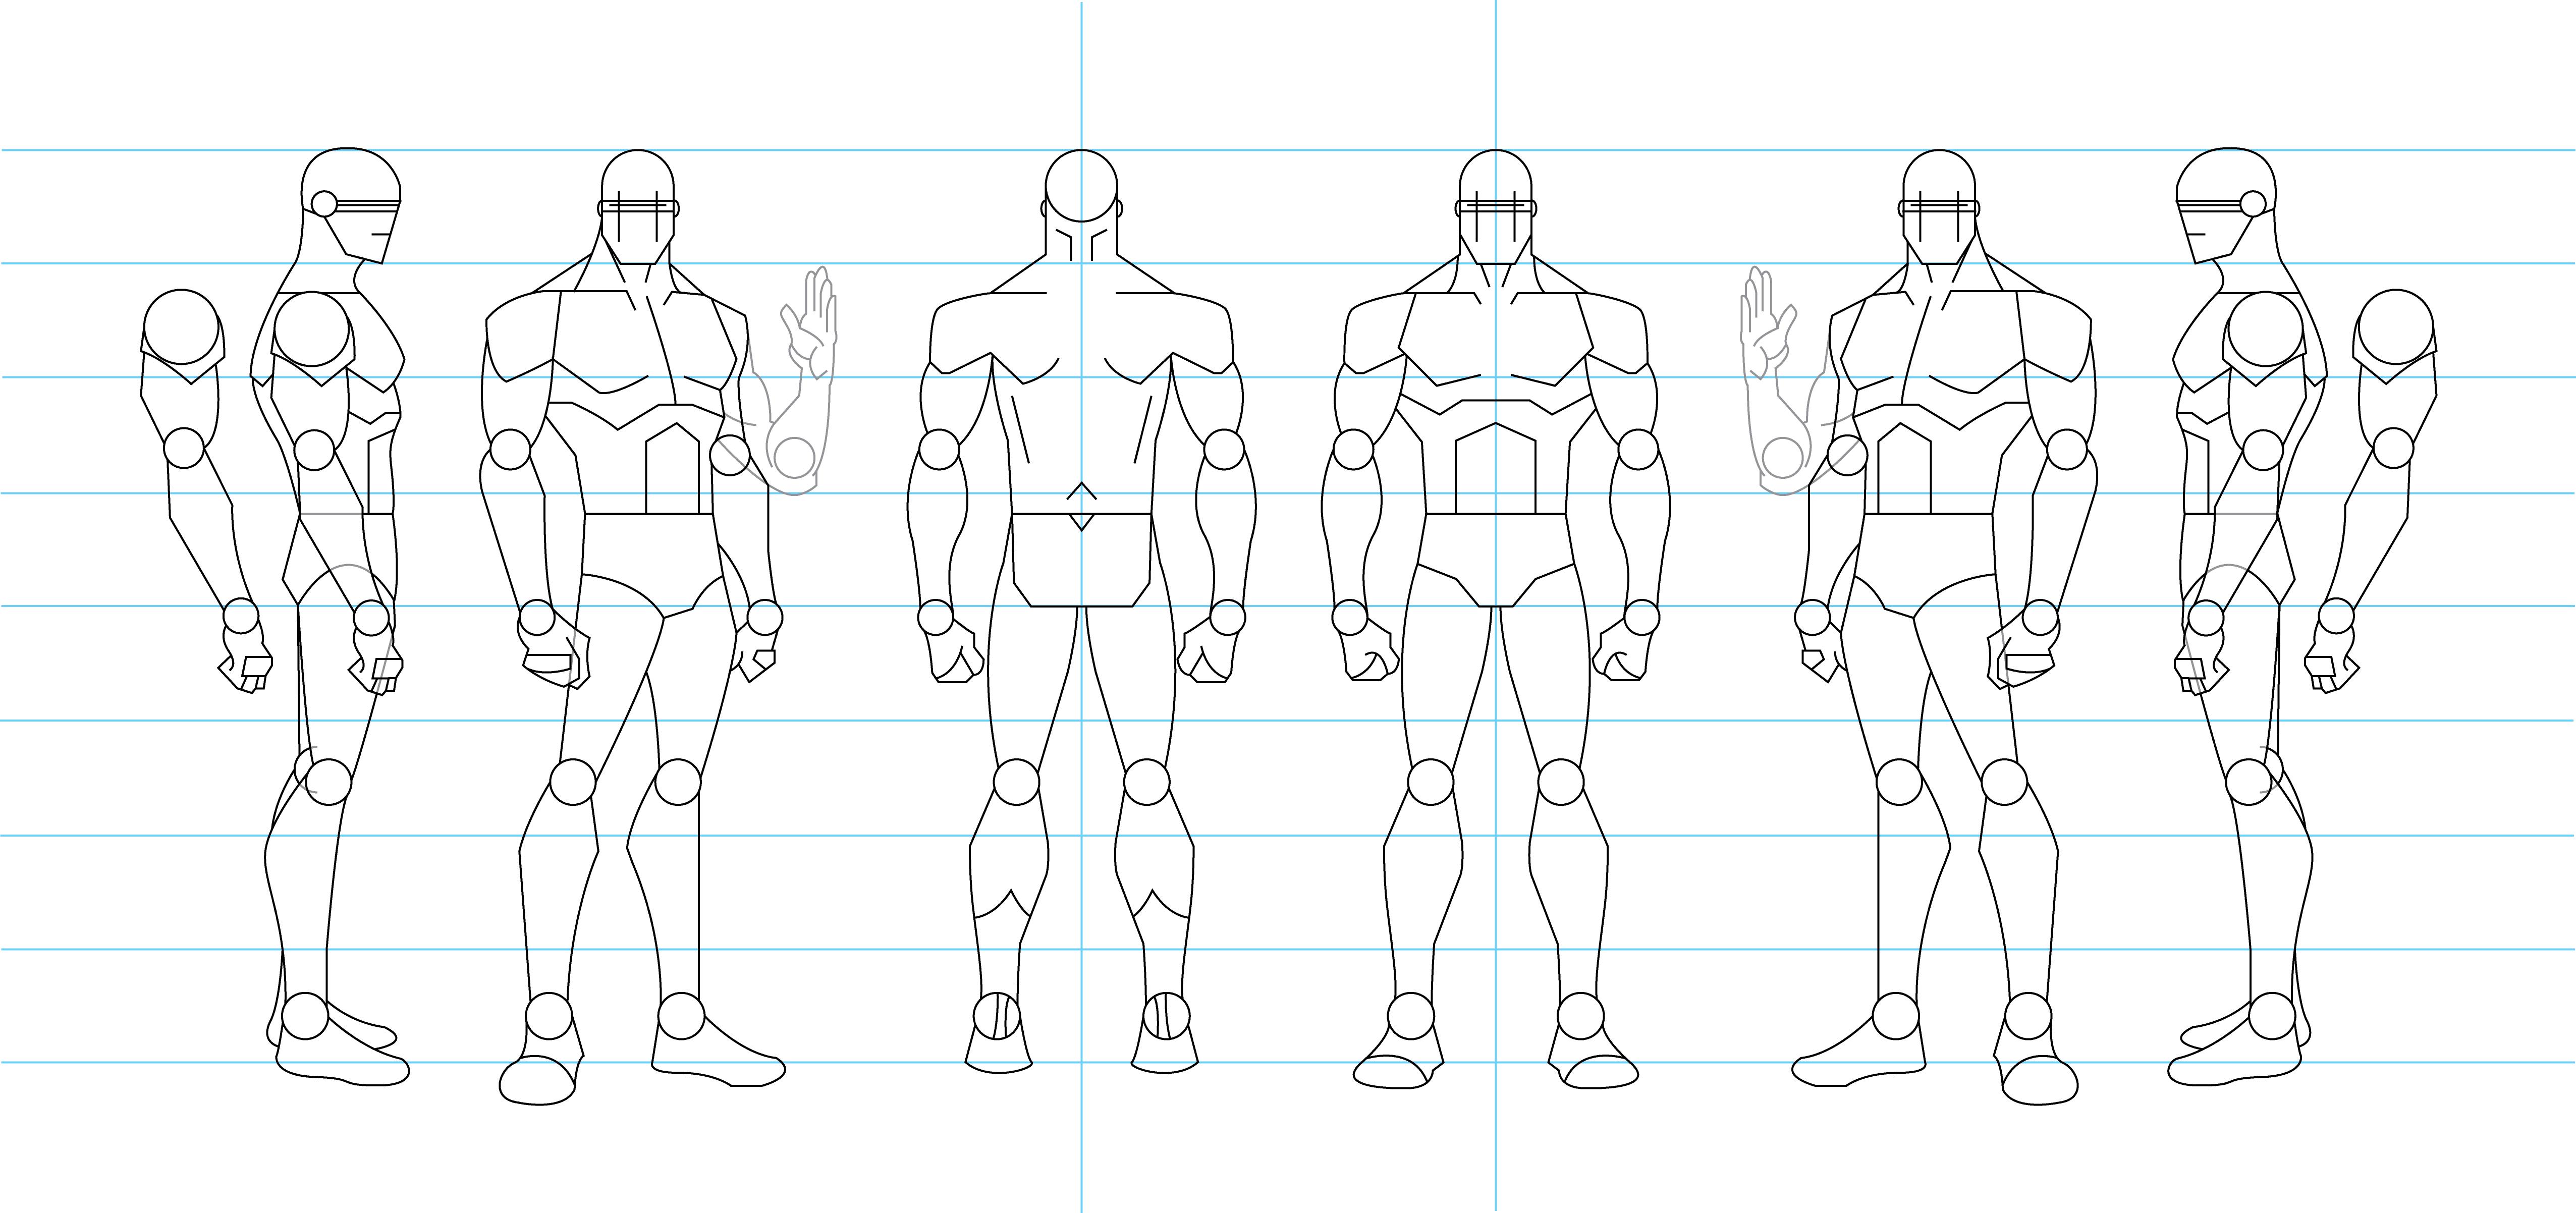 Human Male Figure Drawing | www.imgkid.com - The Image Kid ...